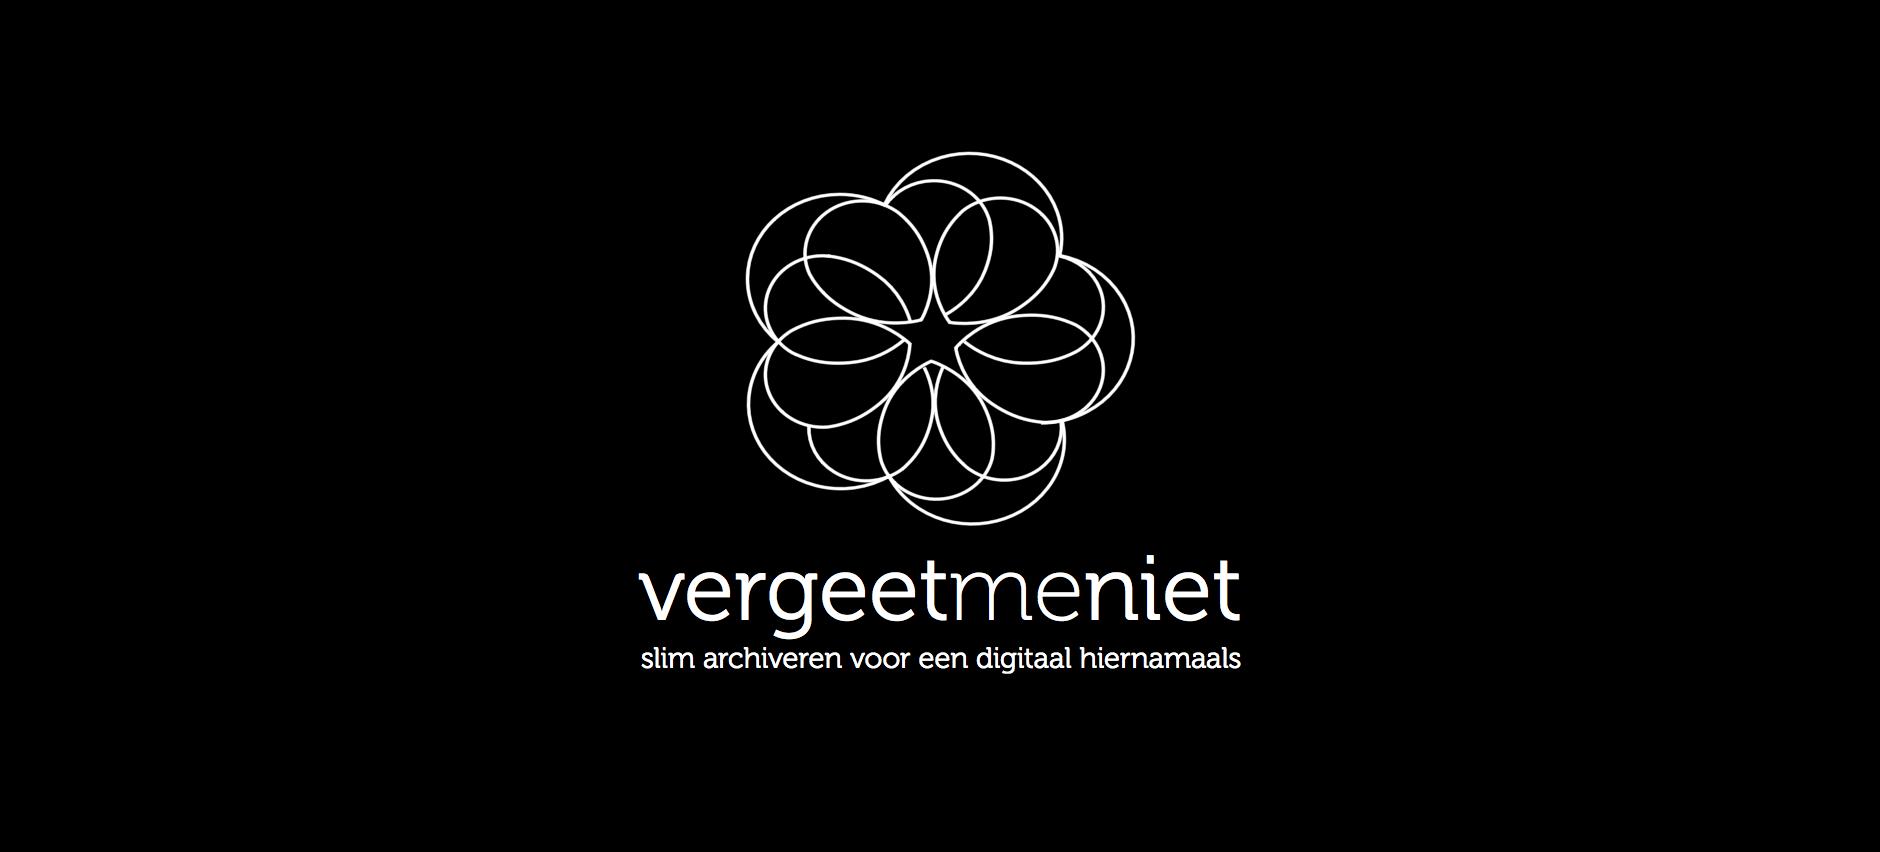 vergeetmeniet-logo